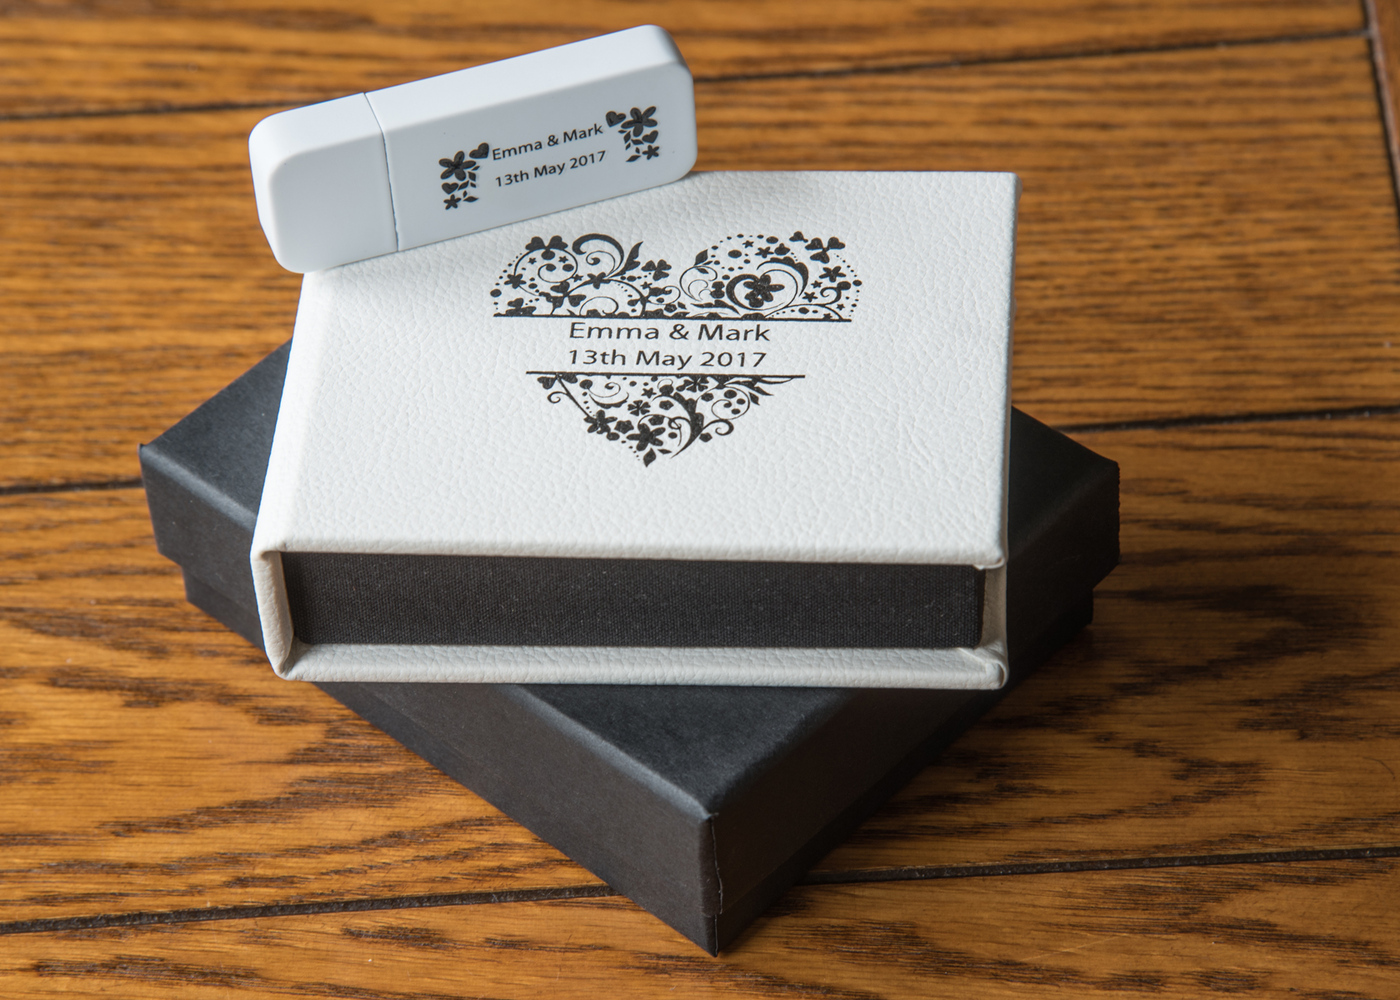 New USB presentation products